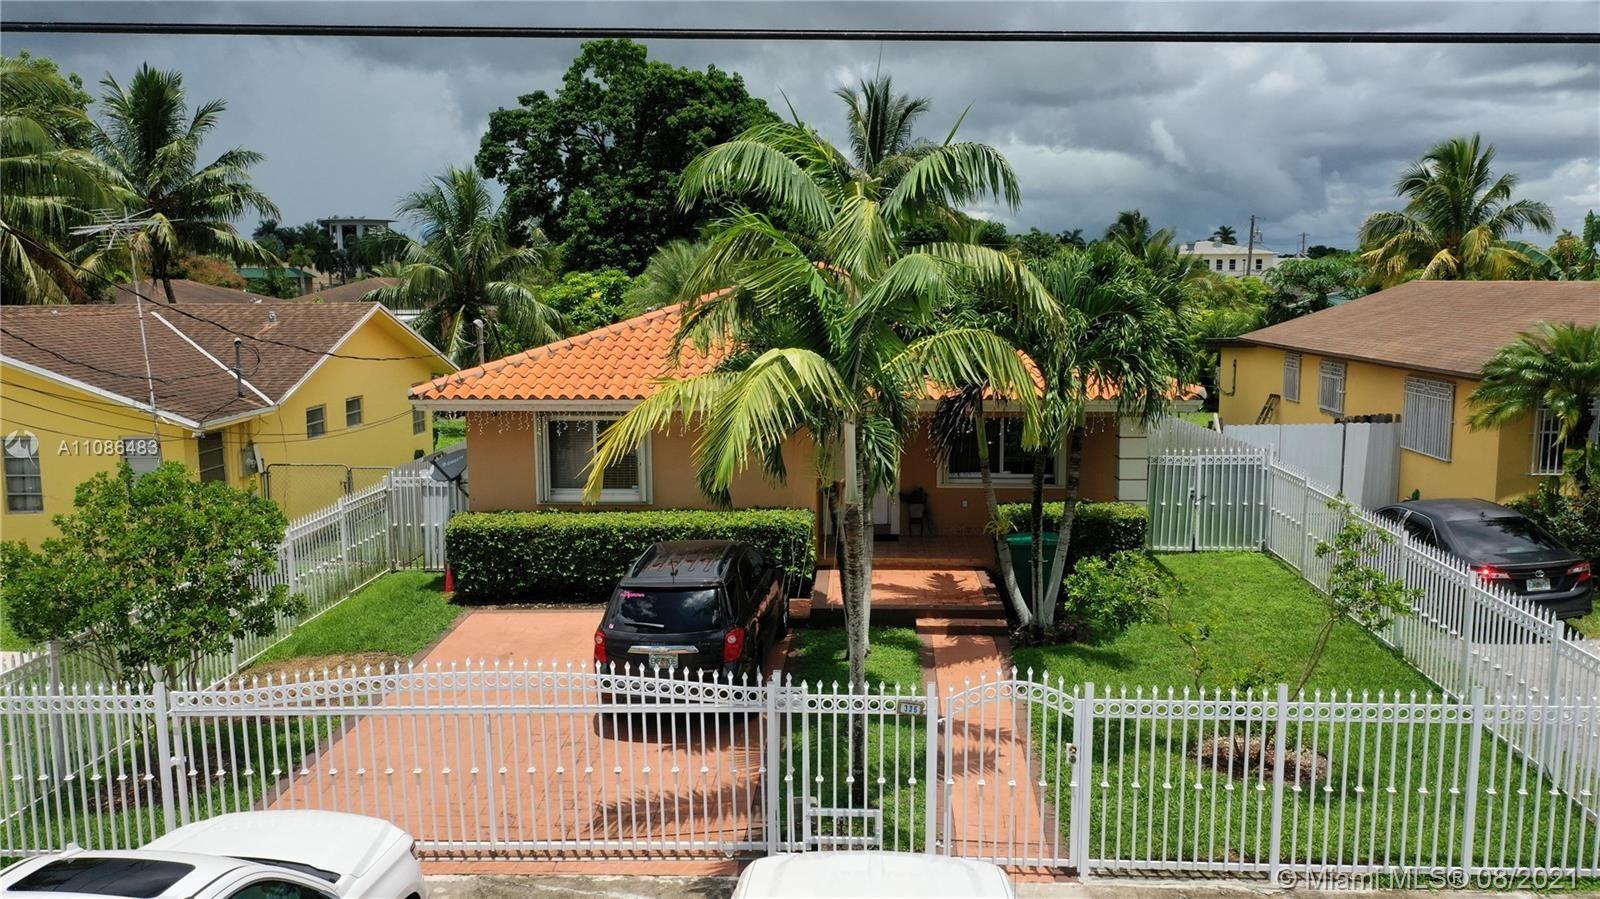 336 SW 2nd St, Florida City, FL 33034 - #: A11086483